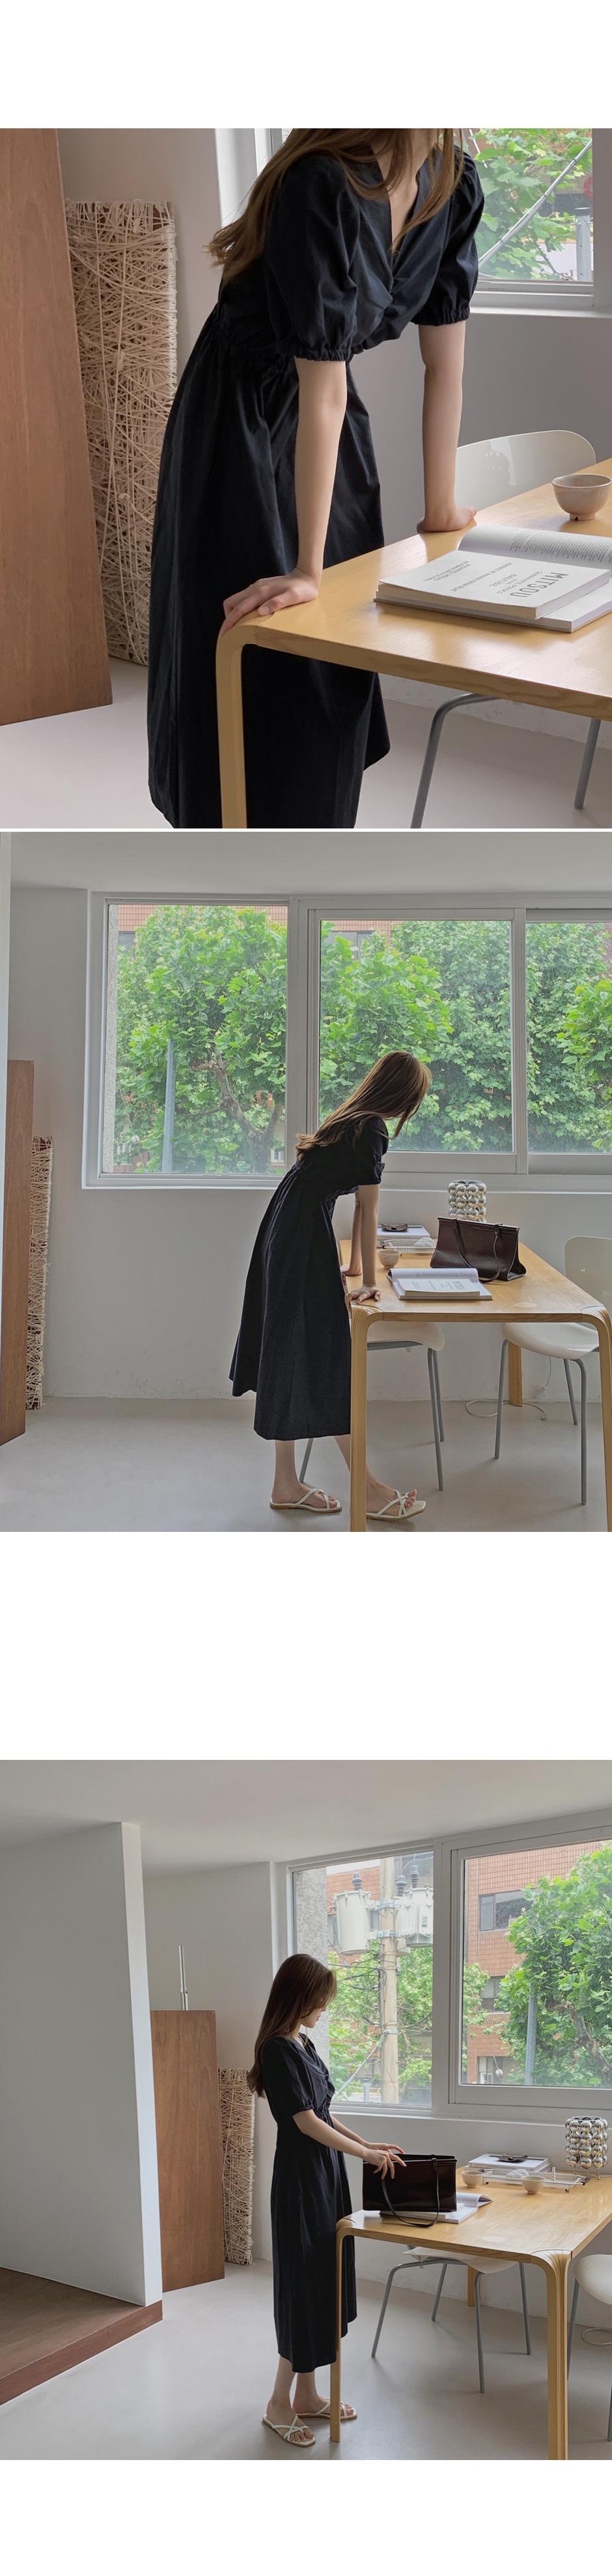 Mering Butterfly Shirring V-Neck Long Dress - 3 color